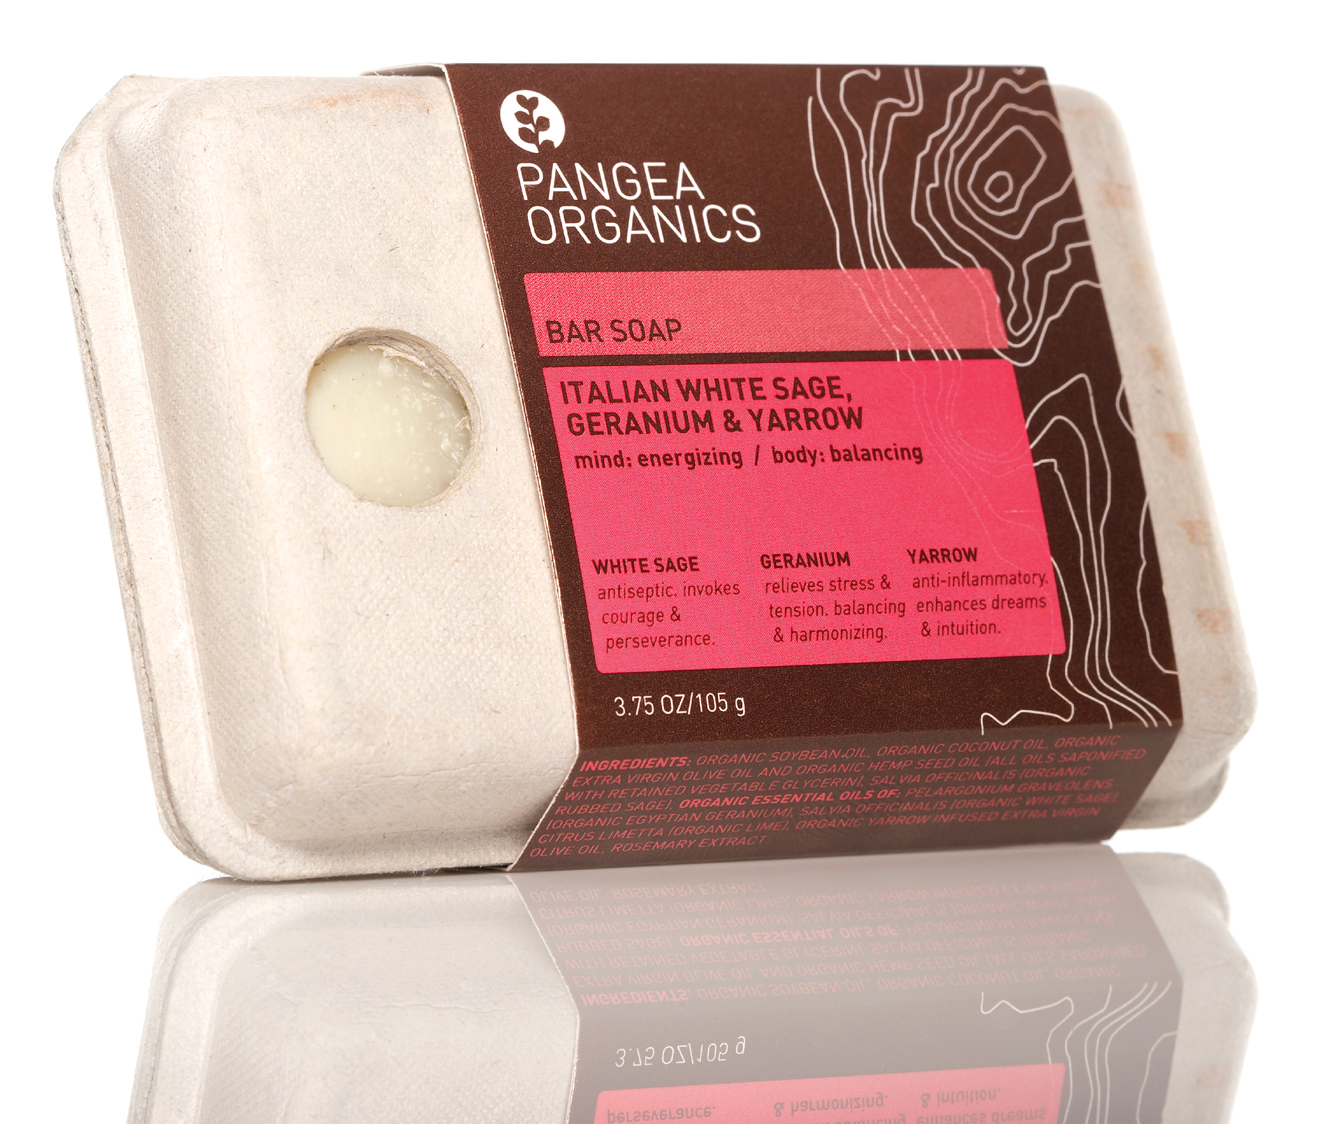 Pangea Organics Soap Best Natural Pangea Organics